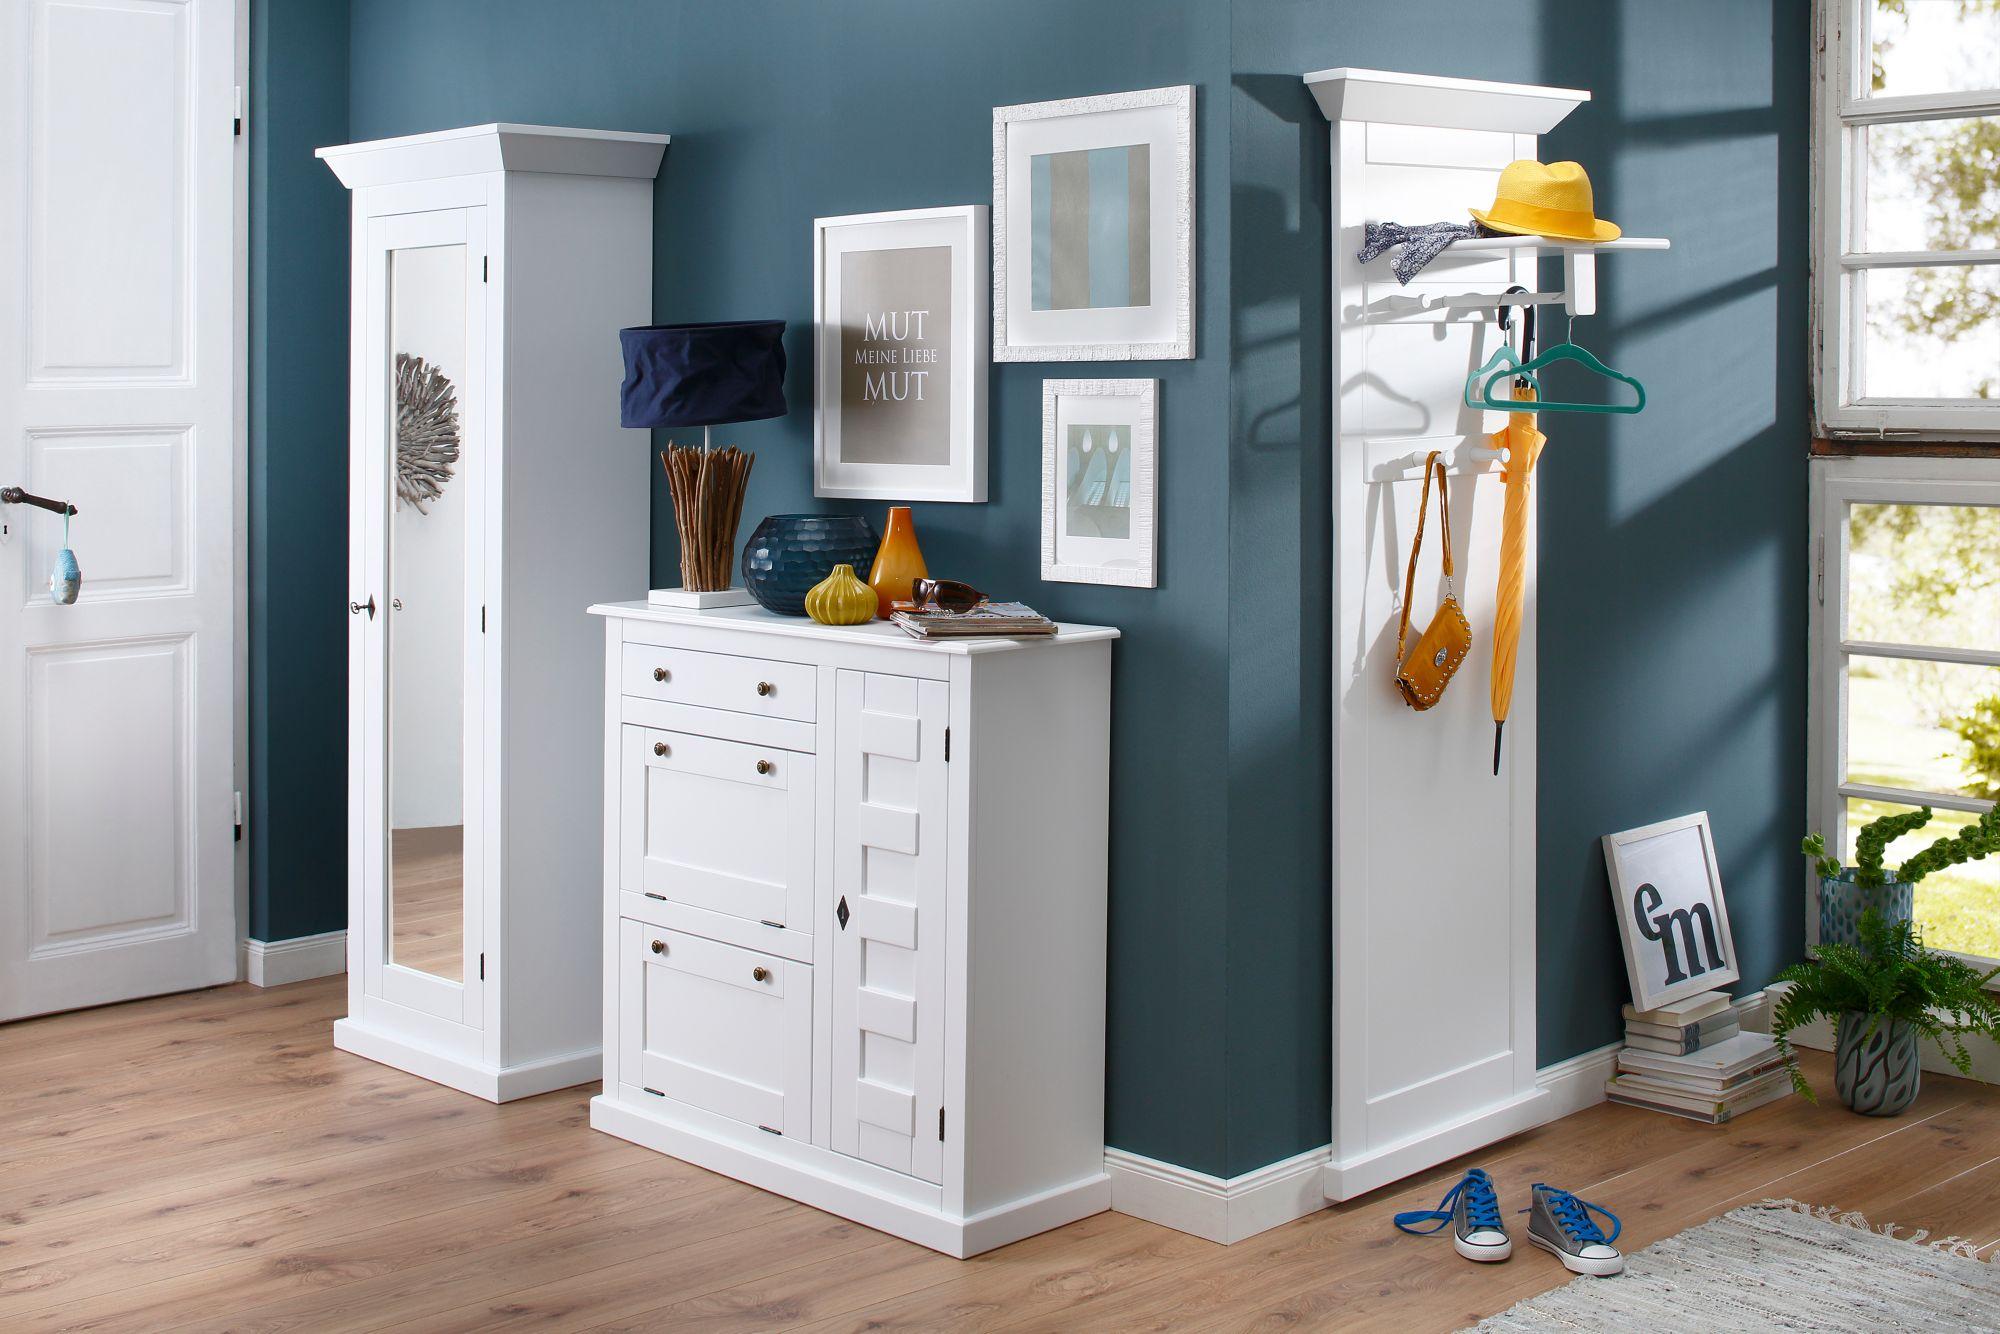 Premium collection by home affaire garderobe nadja for Breite garderobe